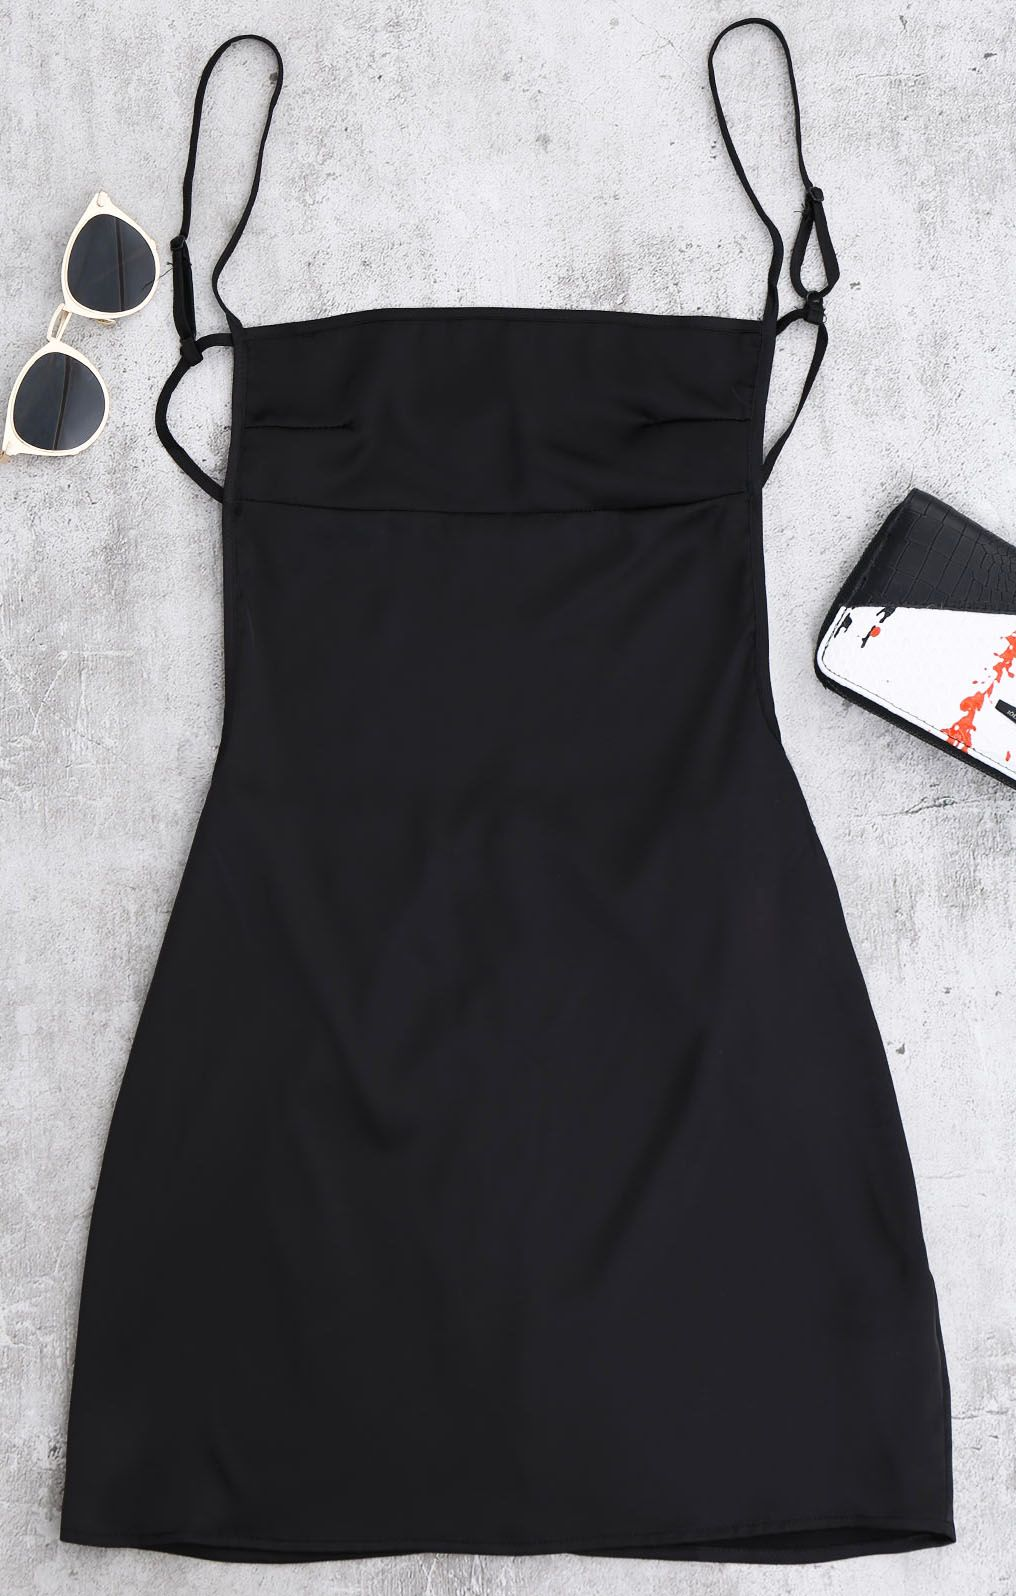 Backless Mini Slip Dress Black Sundress Cute Casual Dresses Mini Slip Dress Black Sundress [ 1596 x 1016 Pixel ]